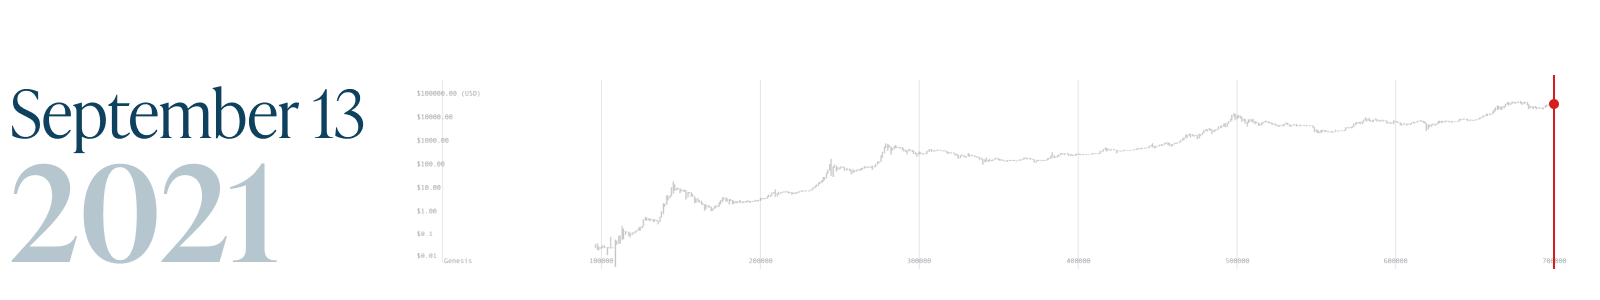 Monochrome_Bitcoin Block 700k_13 Sep 2021.png